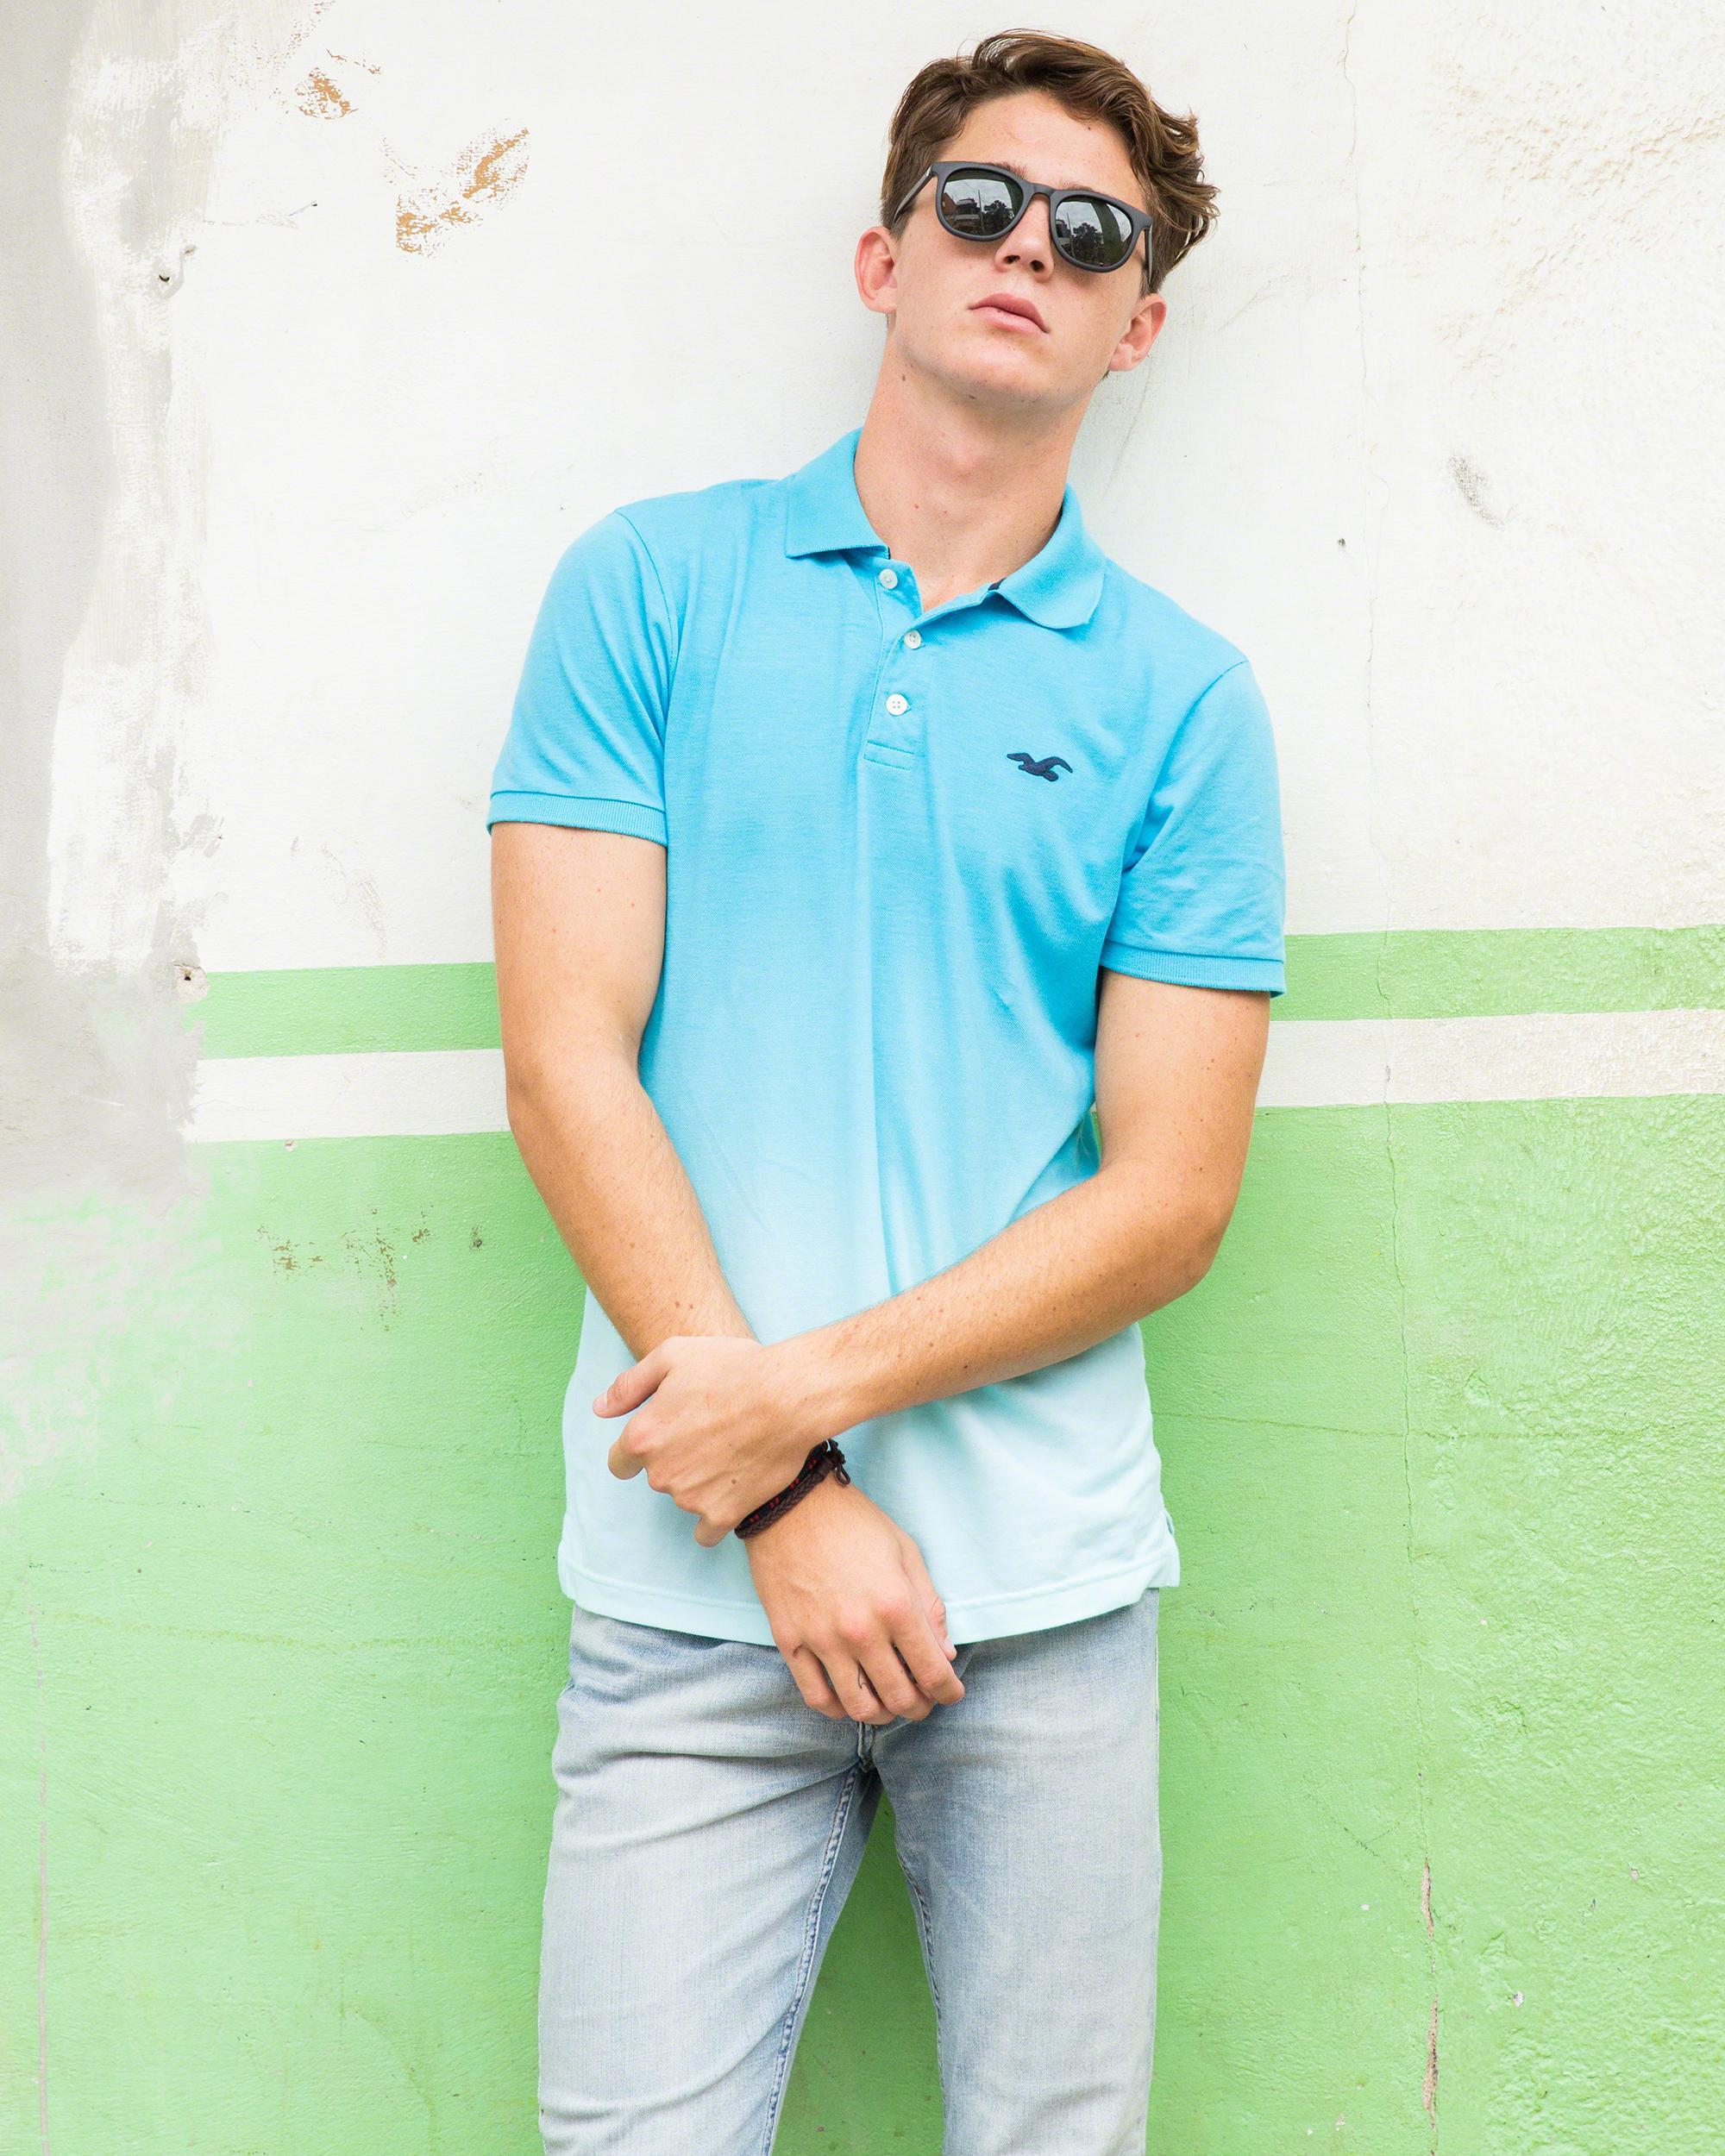 8feaca7fed Lyst - Hollister Sunski Seacliff Sunglasses in Black for Men